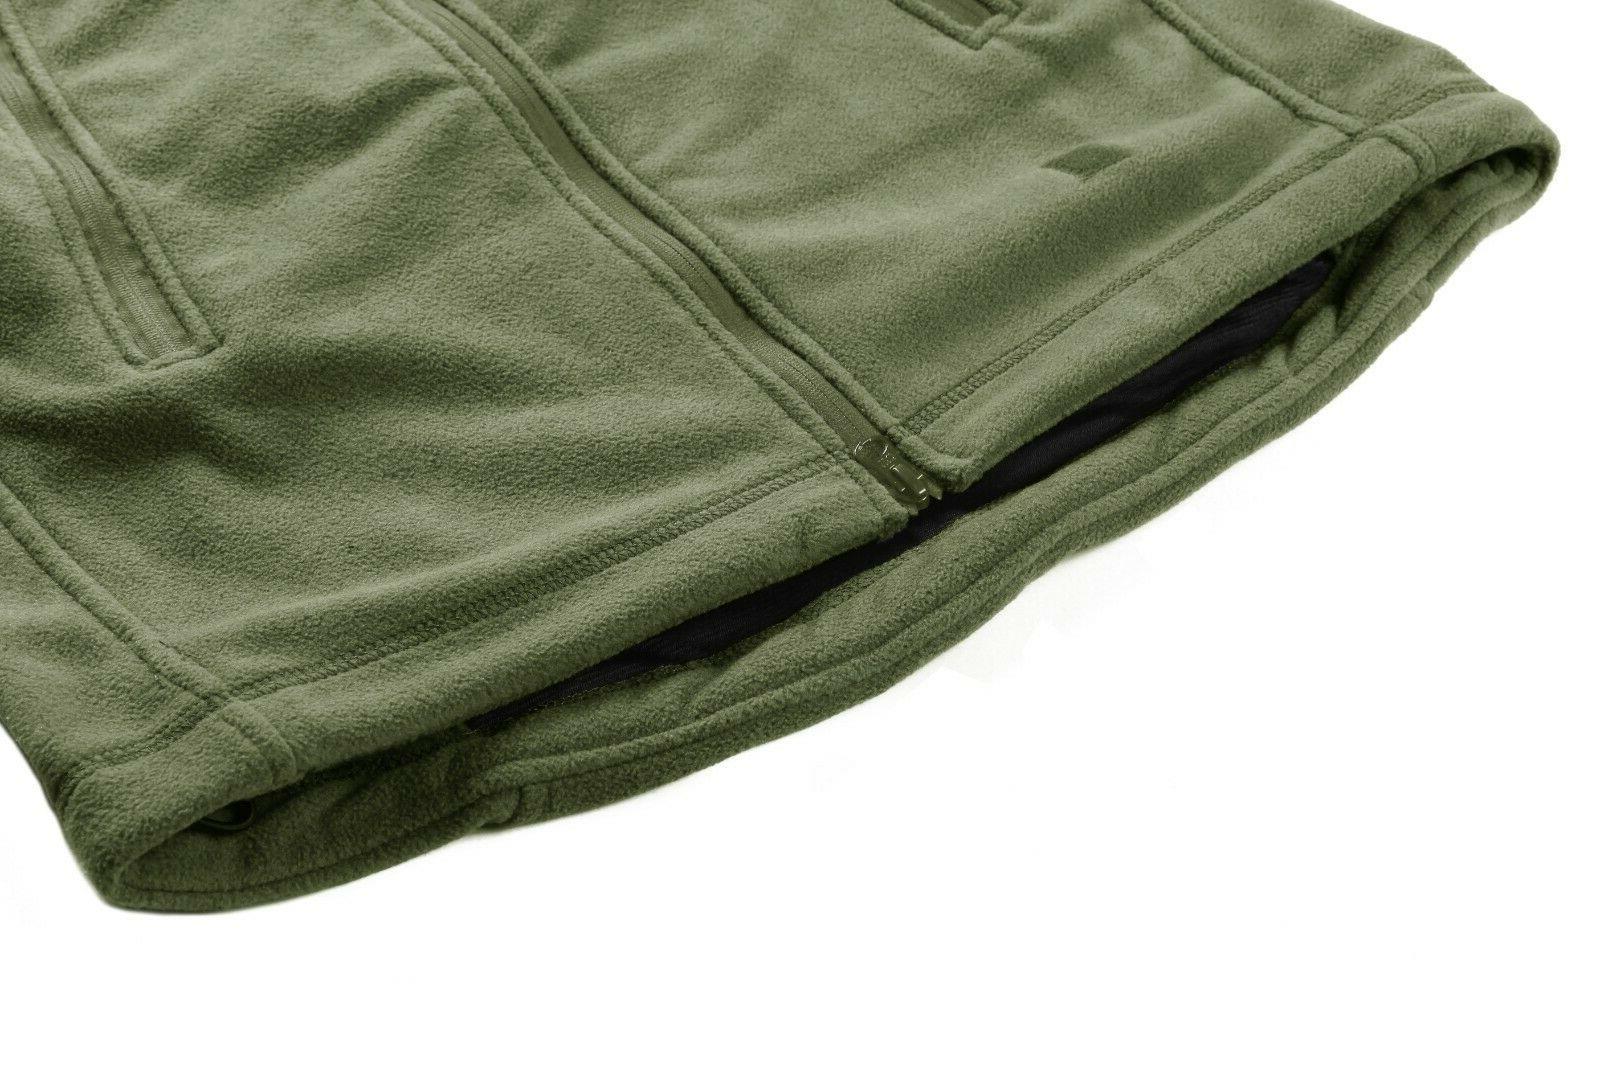 Fleece Lining Jackets Military Tactical Coats Up Outwear